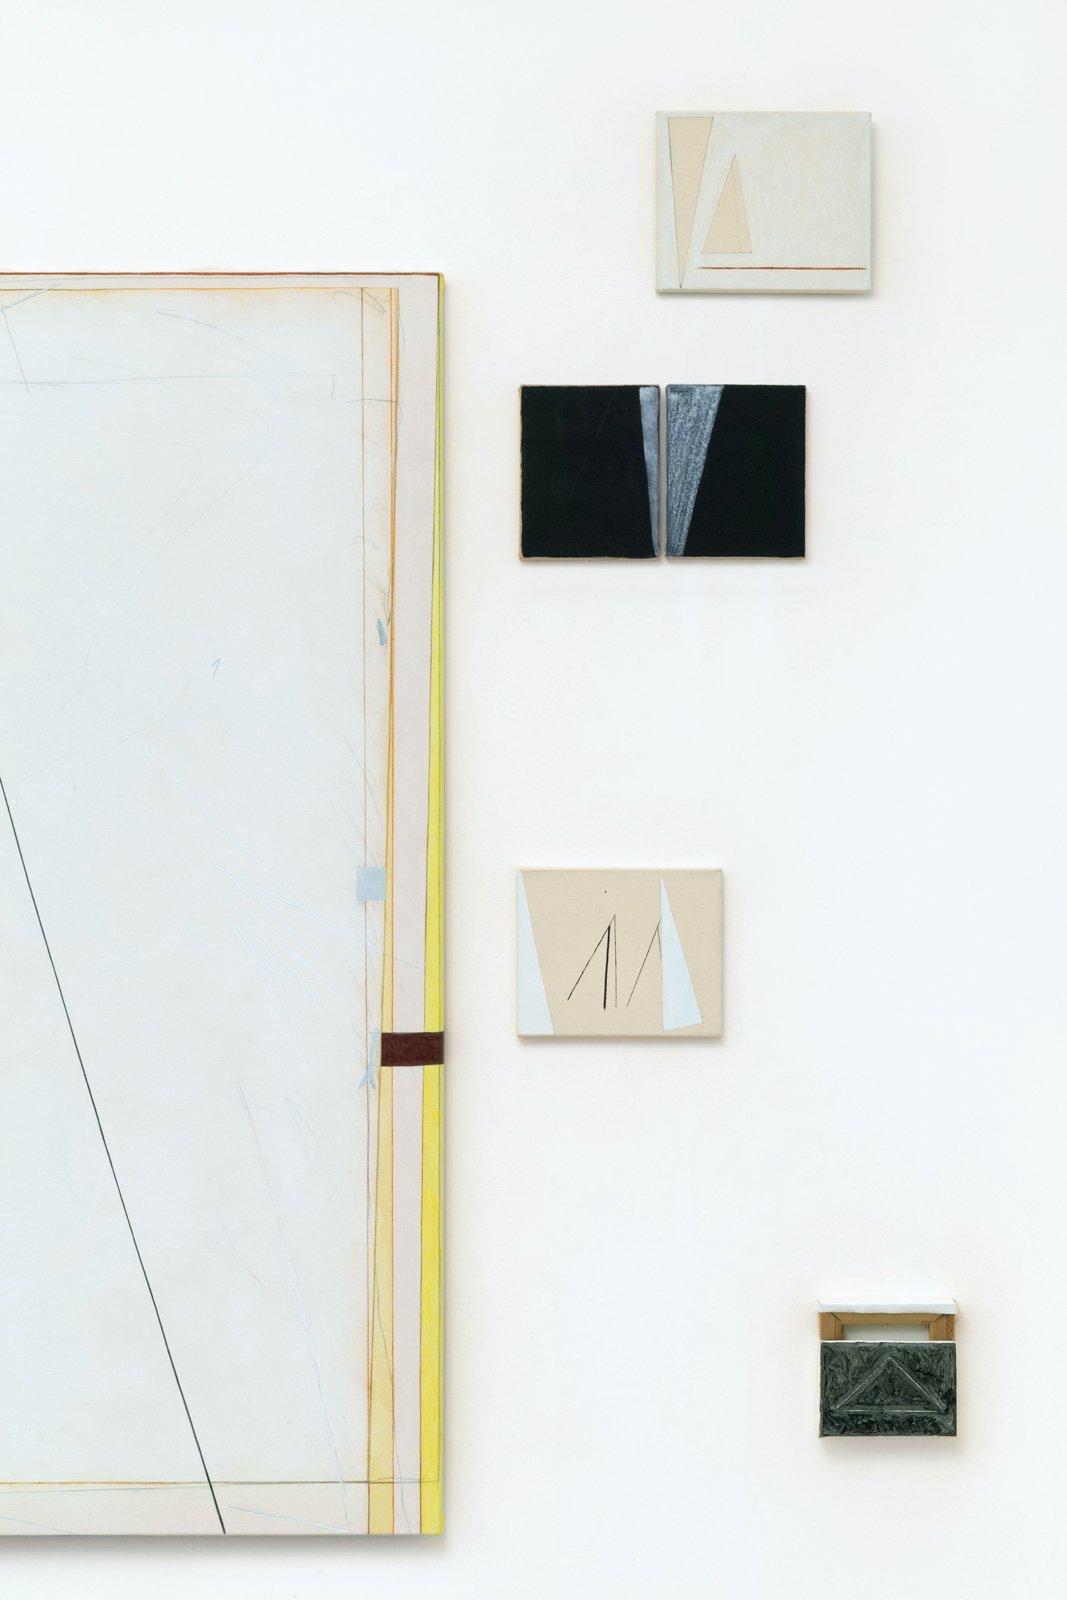 Maureen Paley Studio M Avis Newman 2